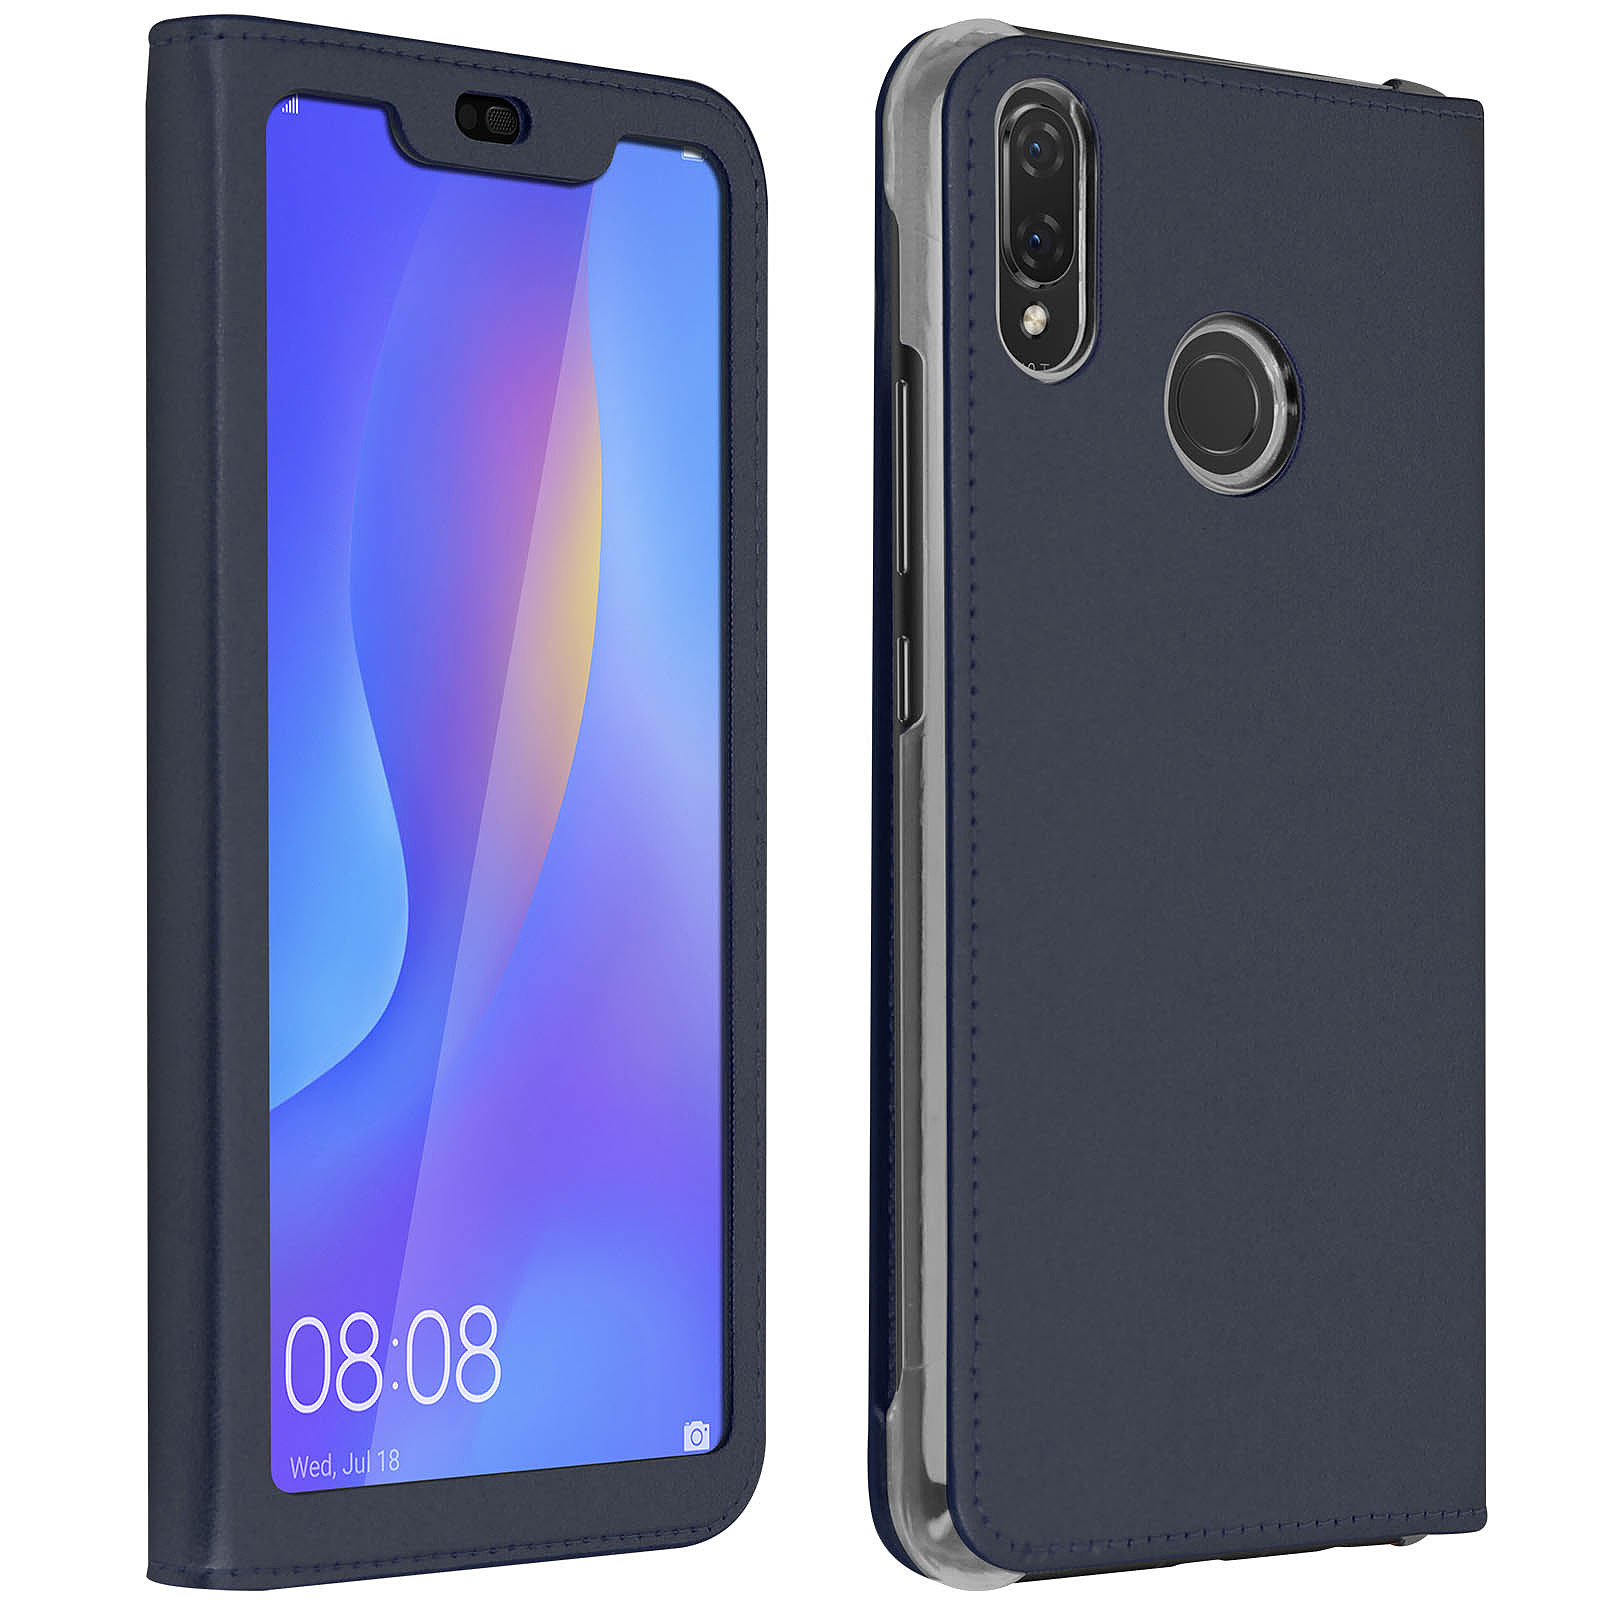 Avizar Etui folio Bleu Nuit pour Huawei P Smart Plus